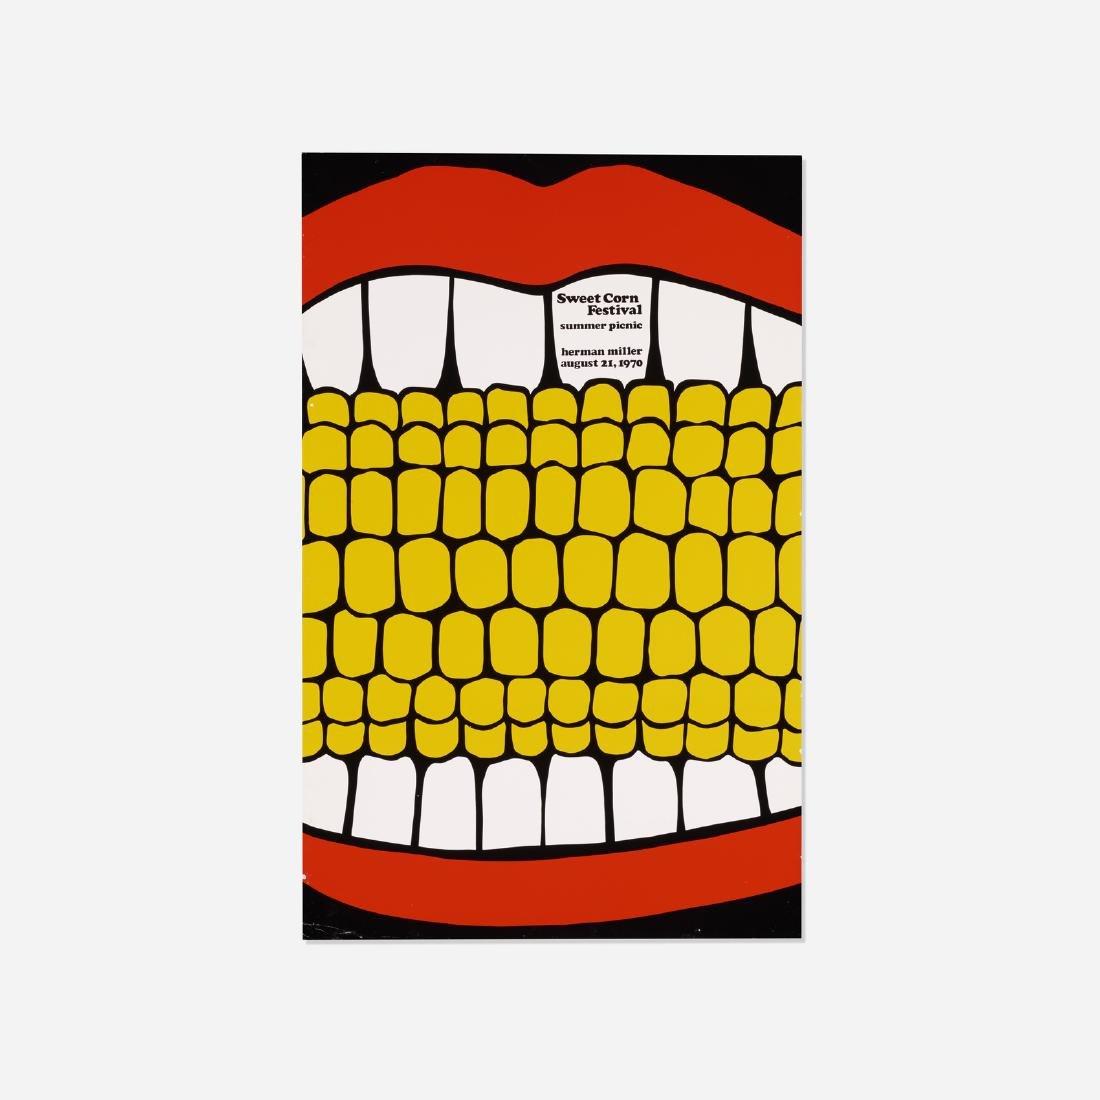 Stephen Frykholm, Herman Miller Summer Picnic poster